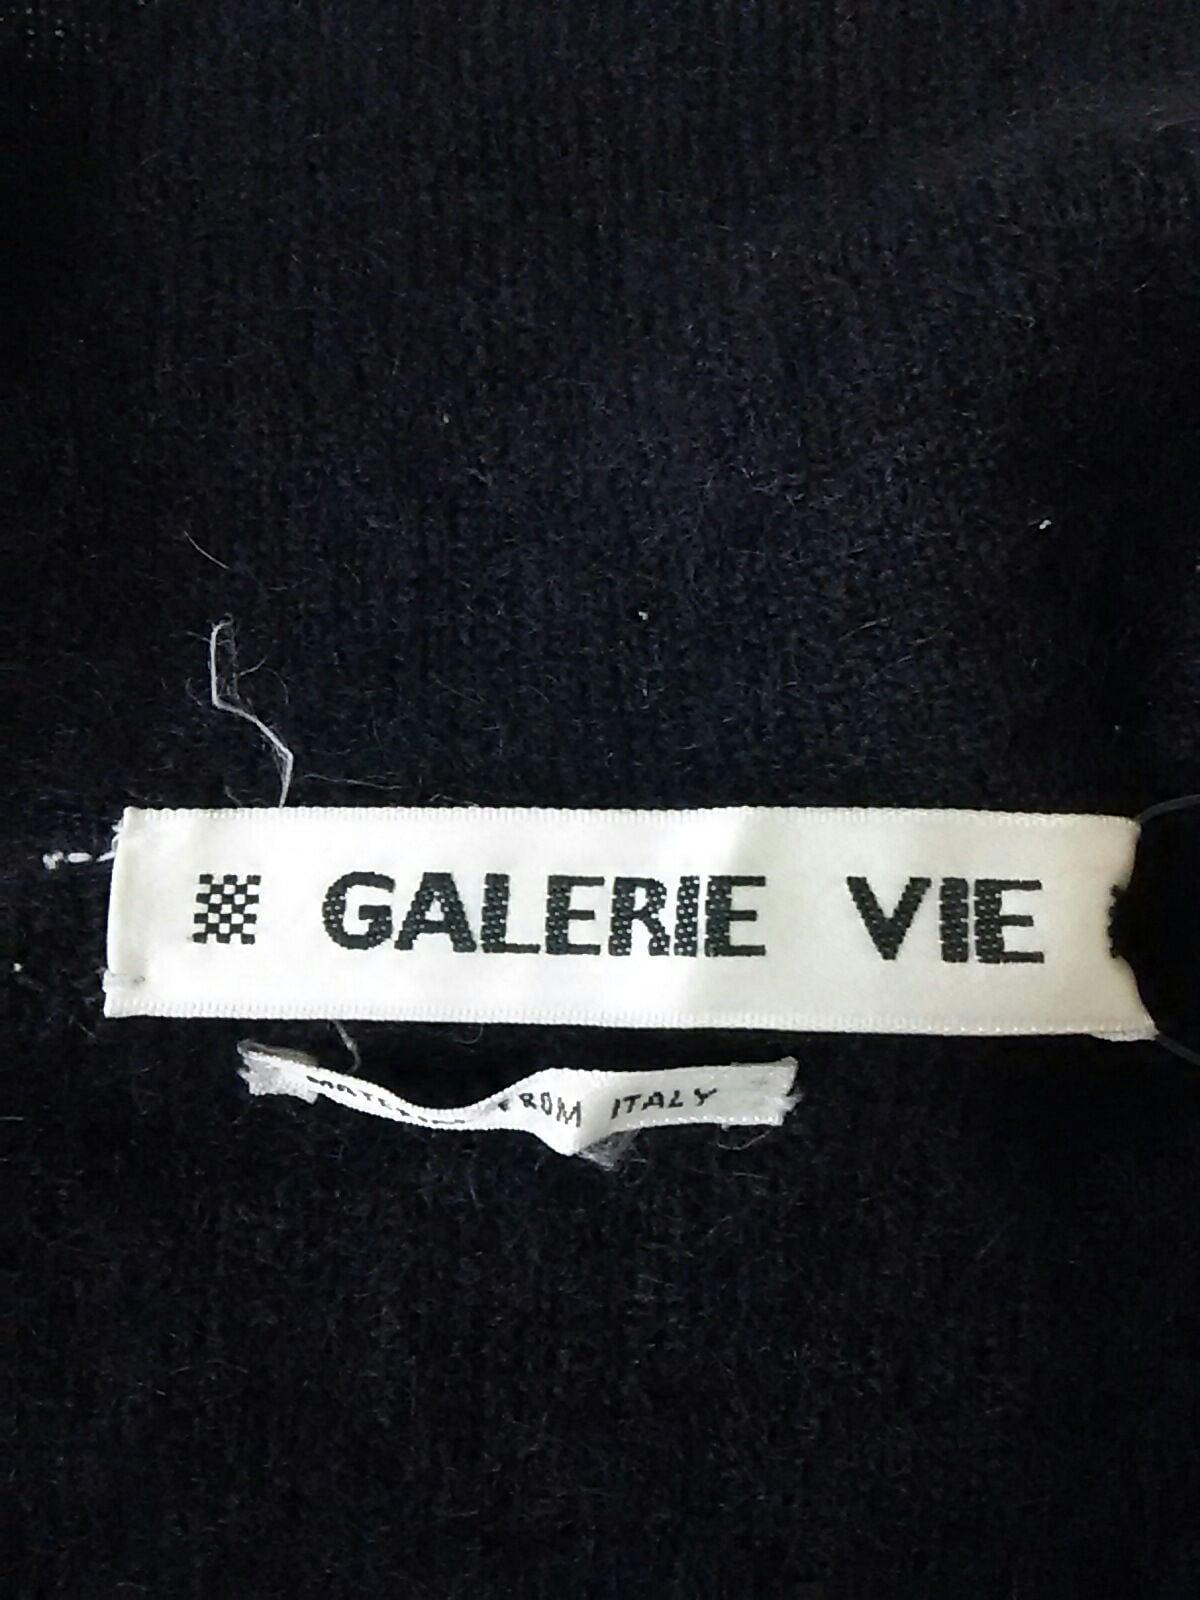 GALERIE VIE(ギャルリーヴィー)のカーディガン